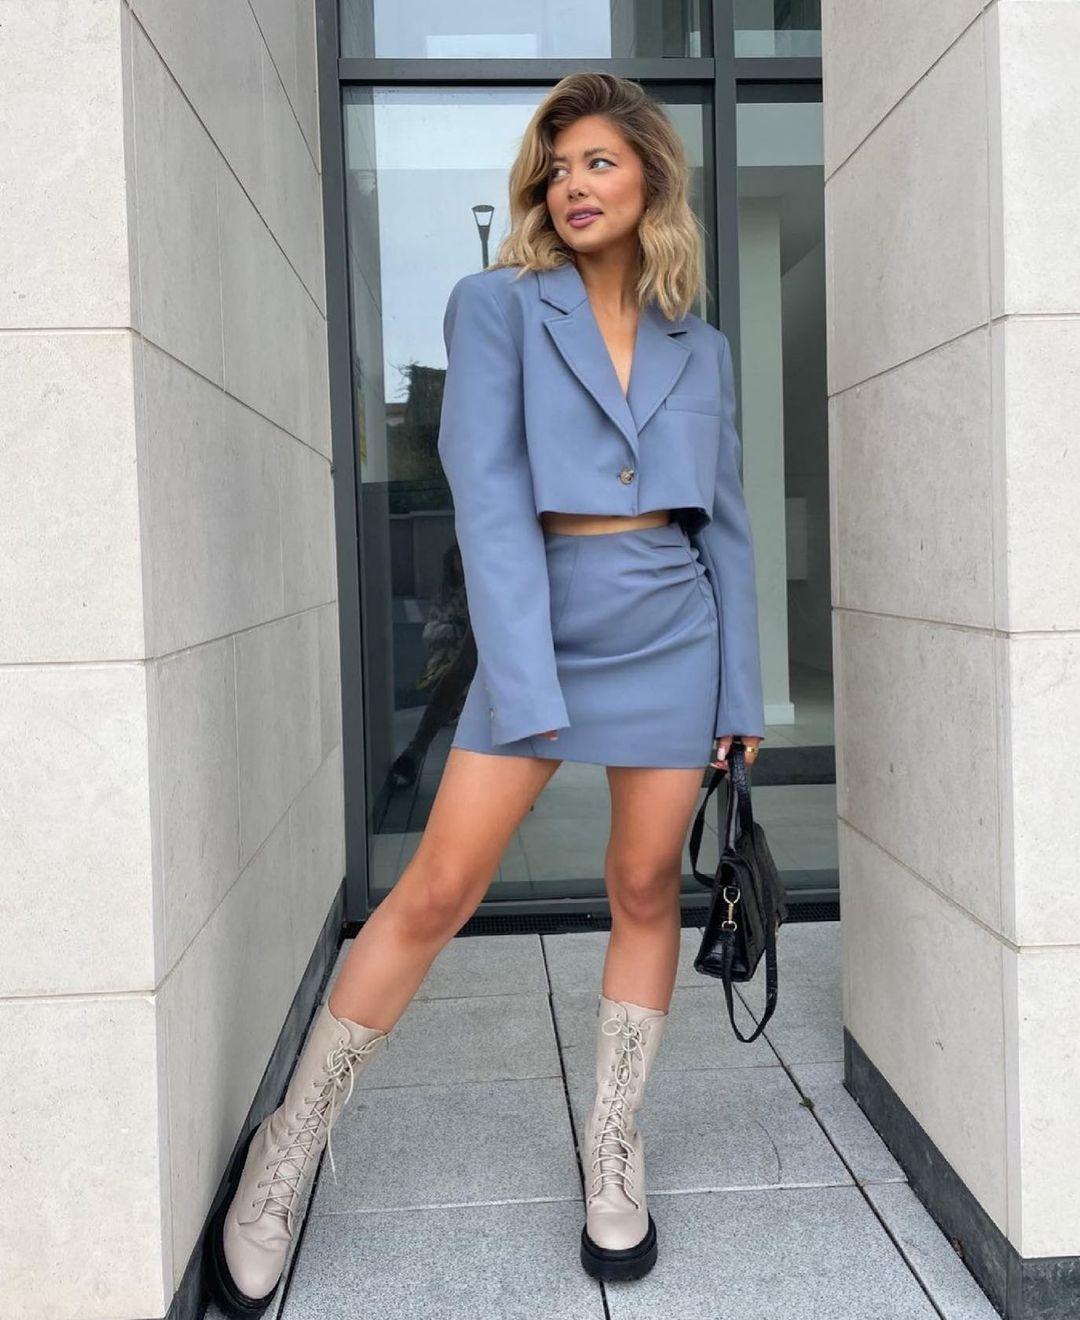 ruched mini skirt de Zara sur zara.style.daily